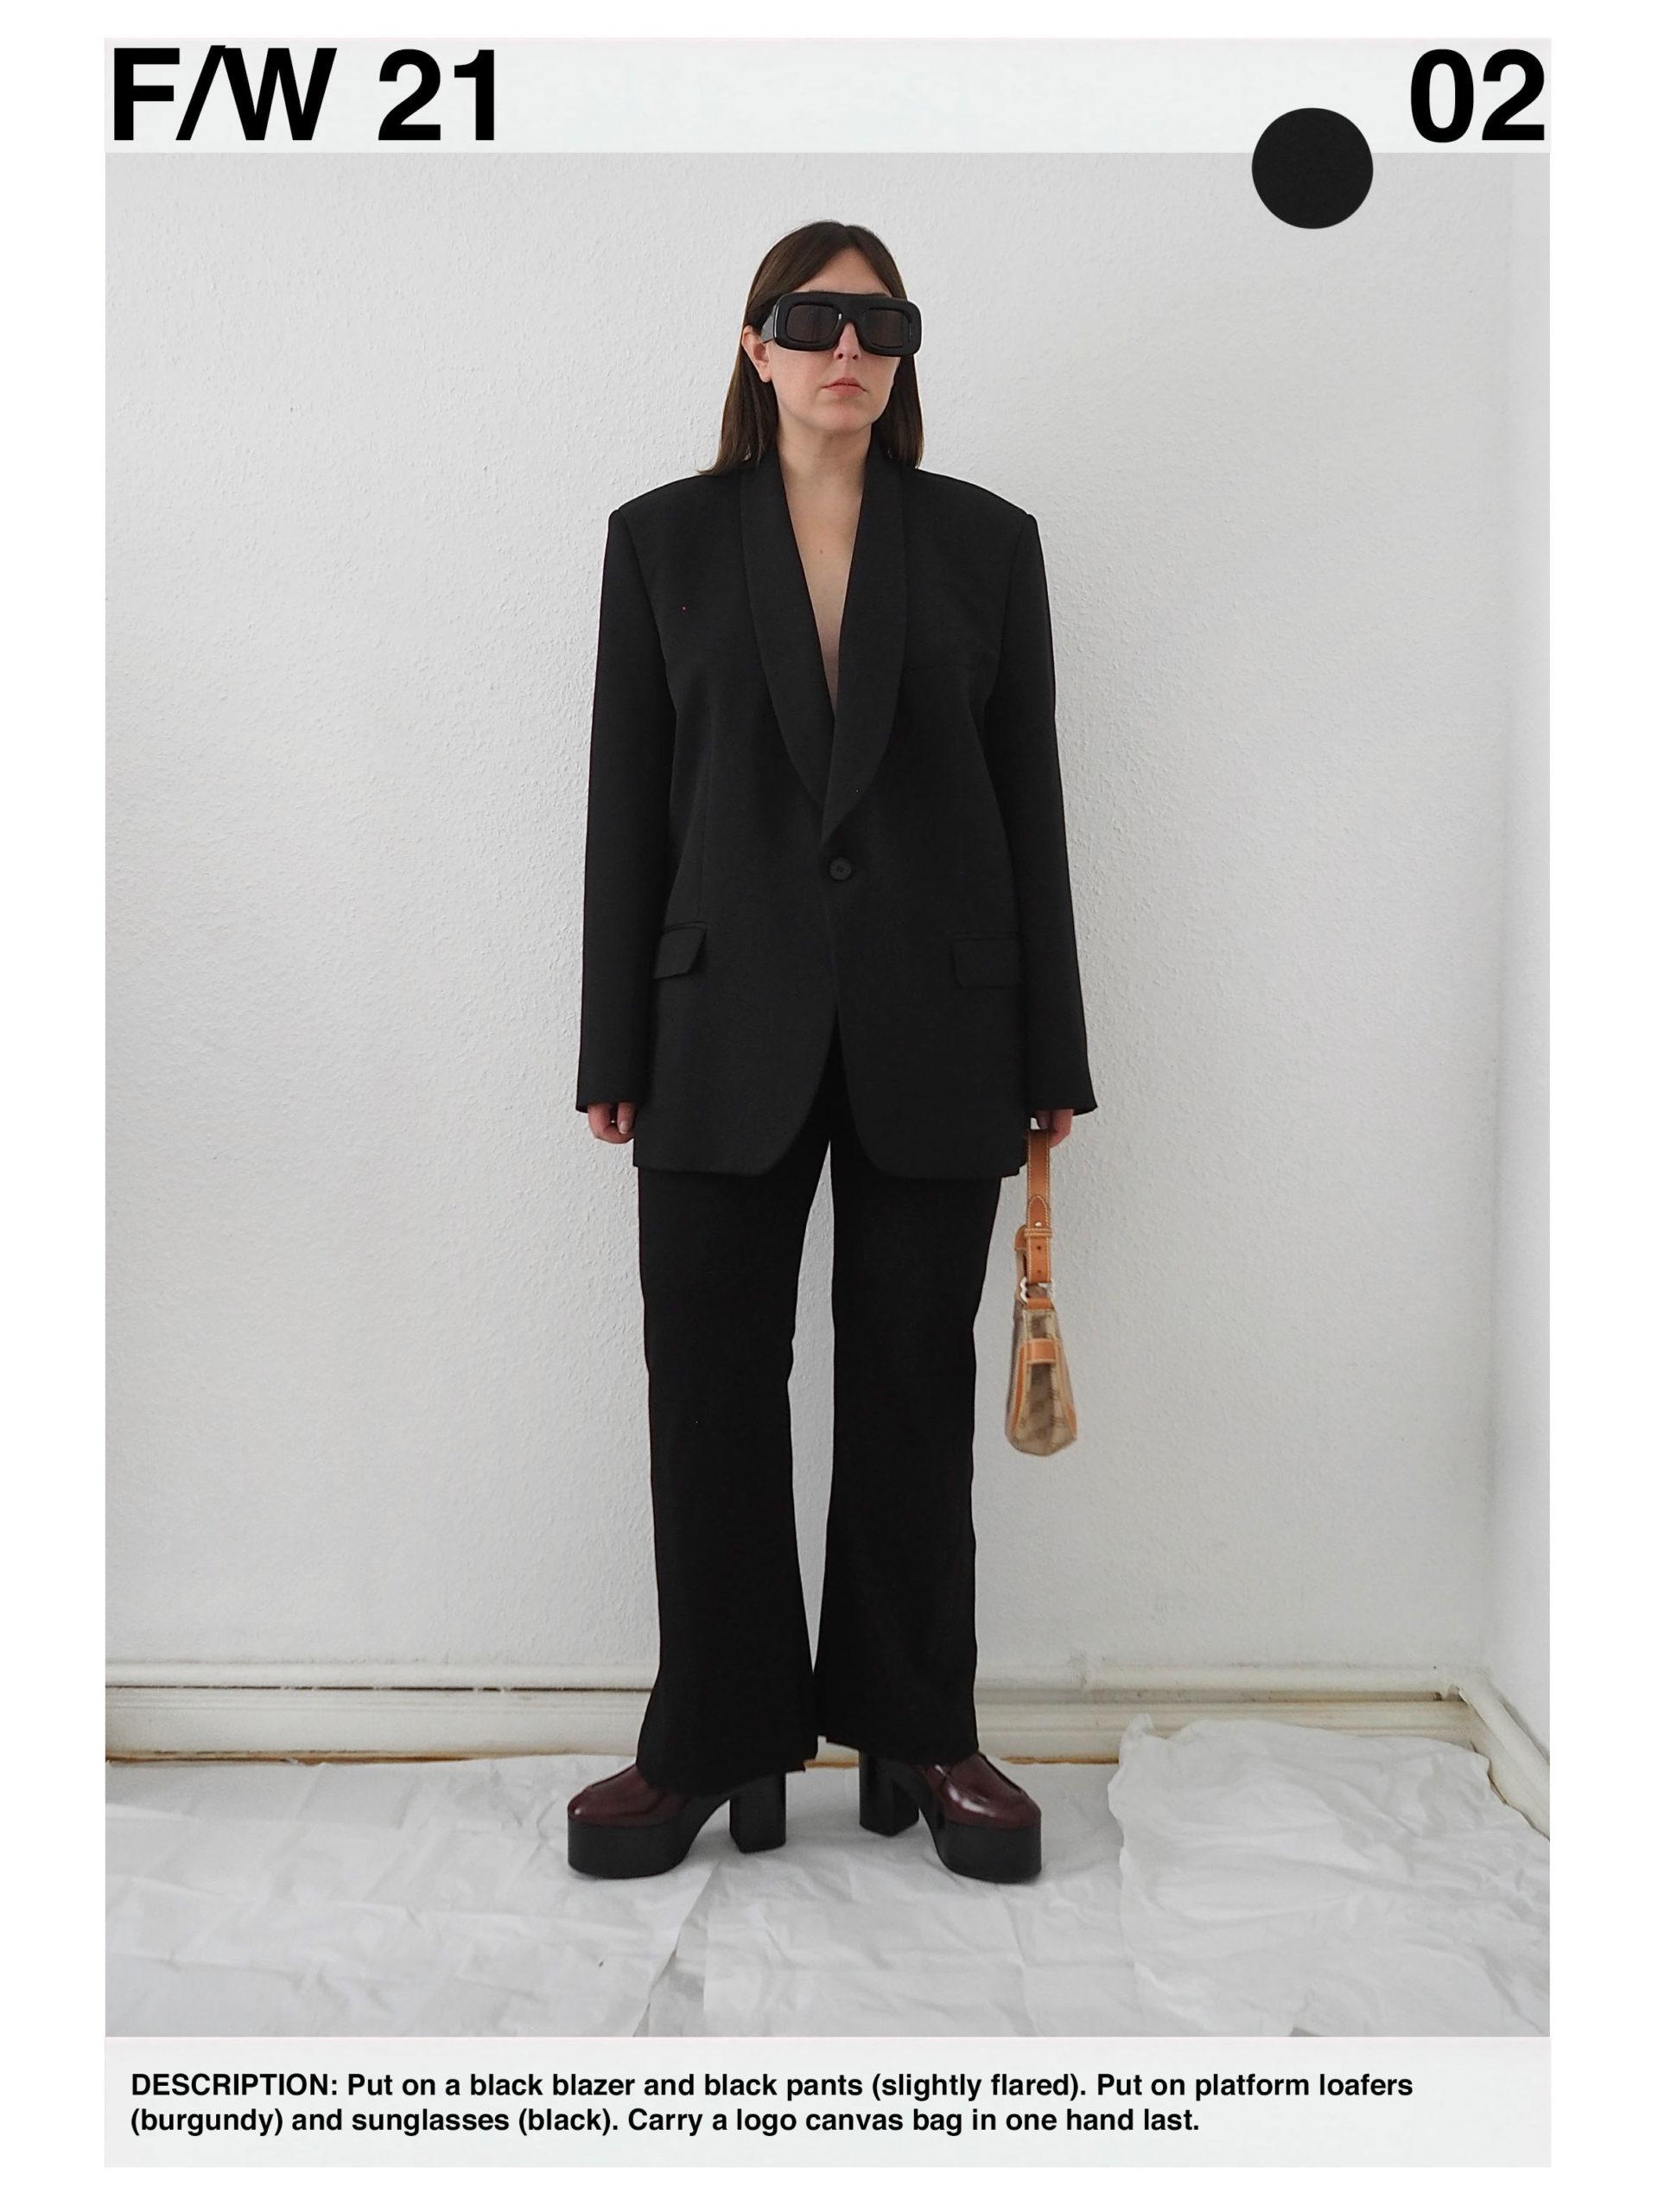 Outfit: Black Maison Margiela oversized blazer, black flared Filippa K pants, burgundy Dries van Noten platform loafers, Acne Studios black oversized sunglasses, Vintage logo canvas Balenciaga bag